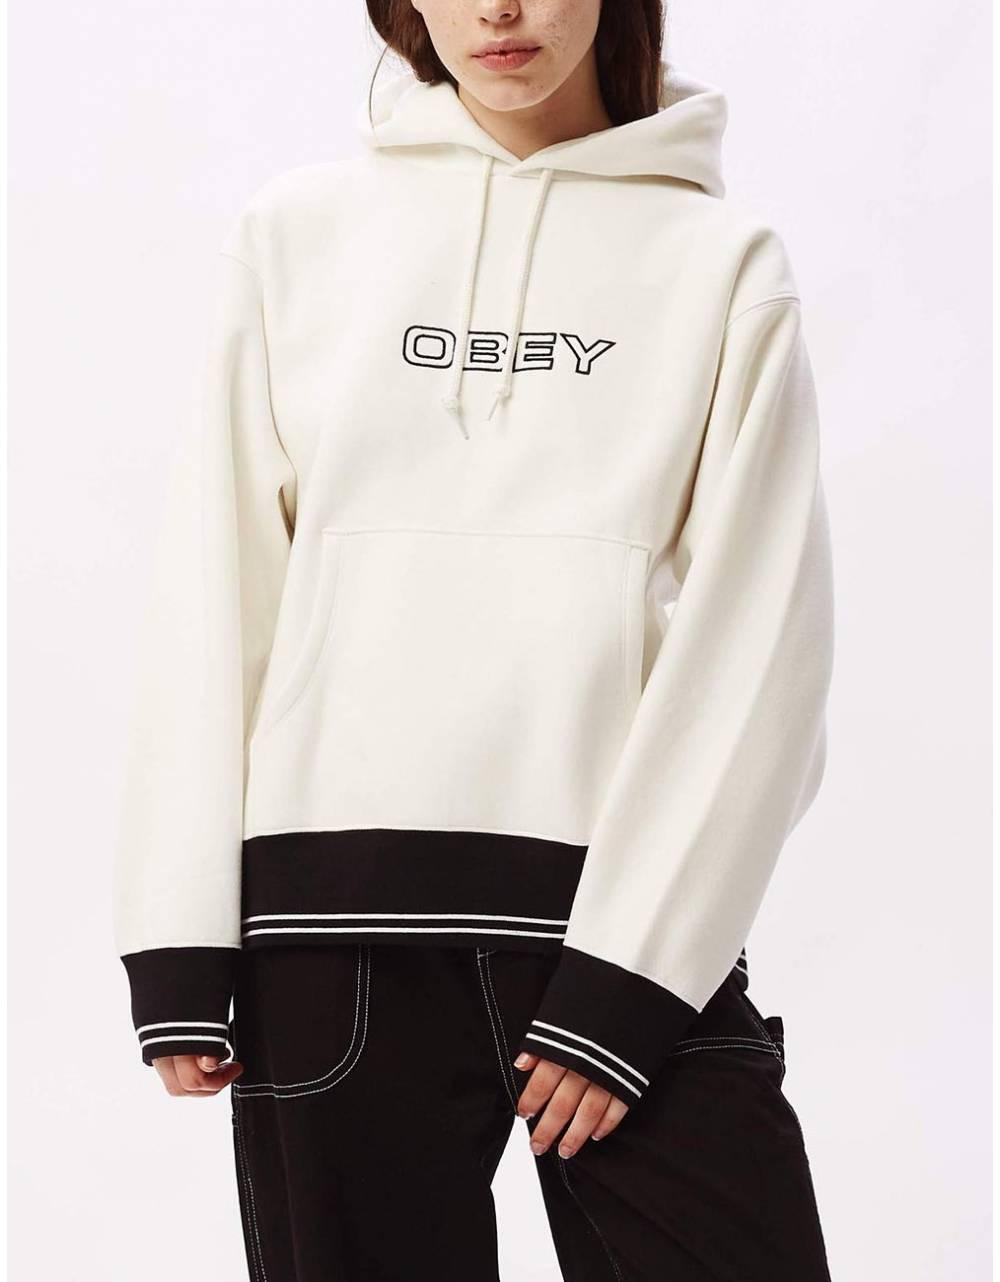 Obey Woman Gordon hoodie - bone obey Sweater 102,00€